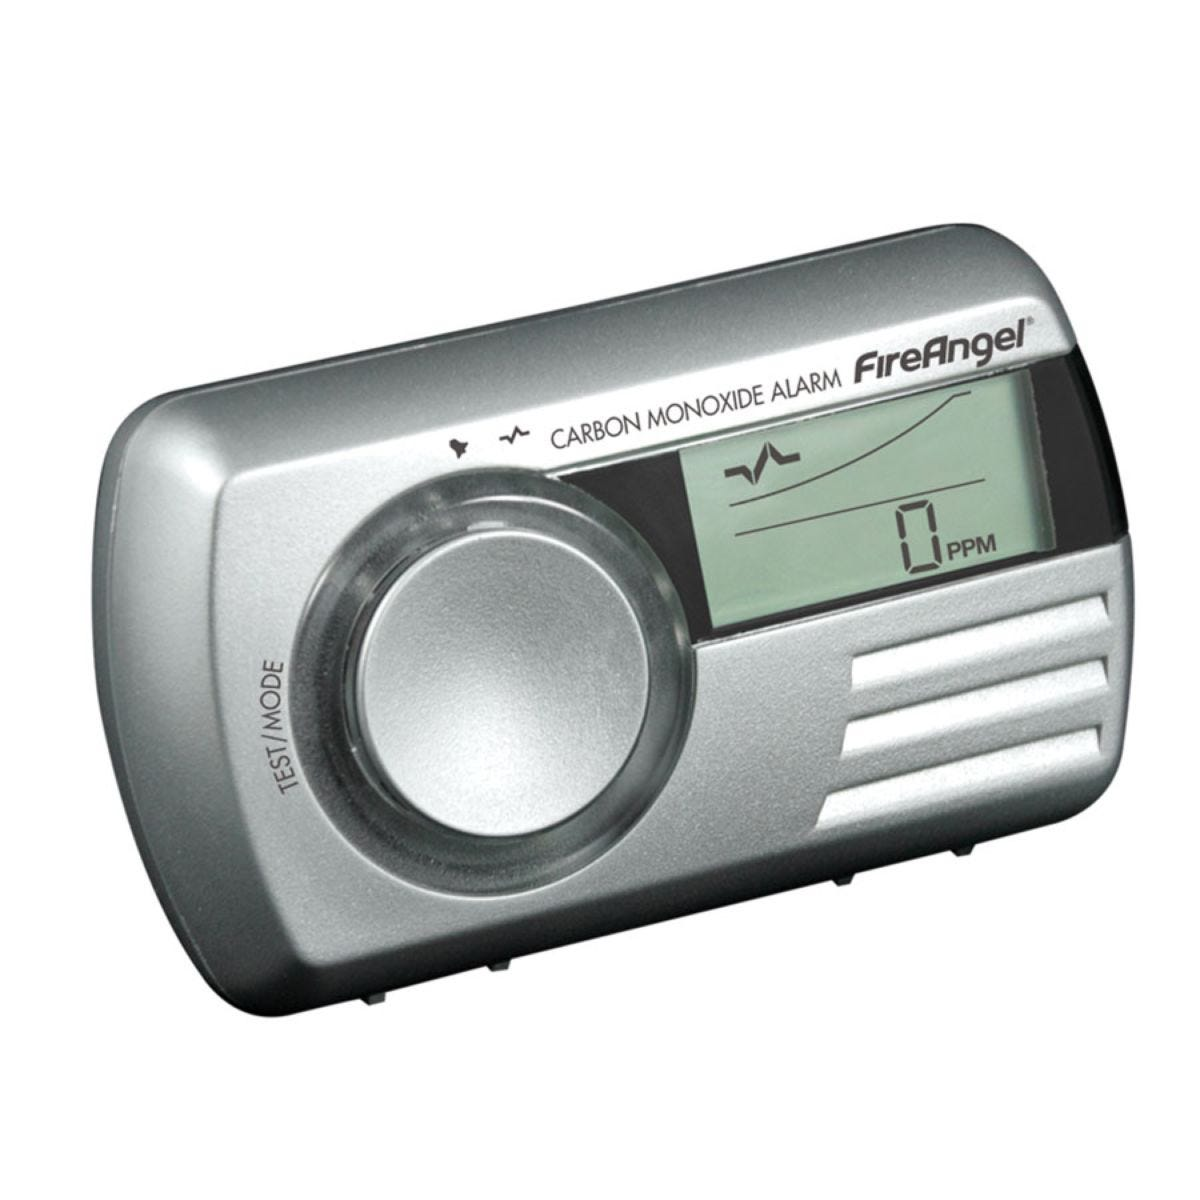 FireAngel Digital Carbon Monoxide Alarm - Silver